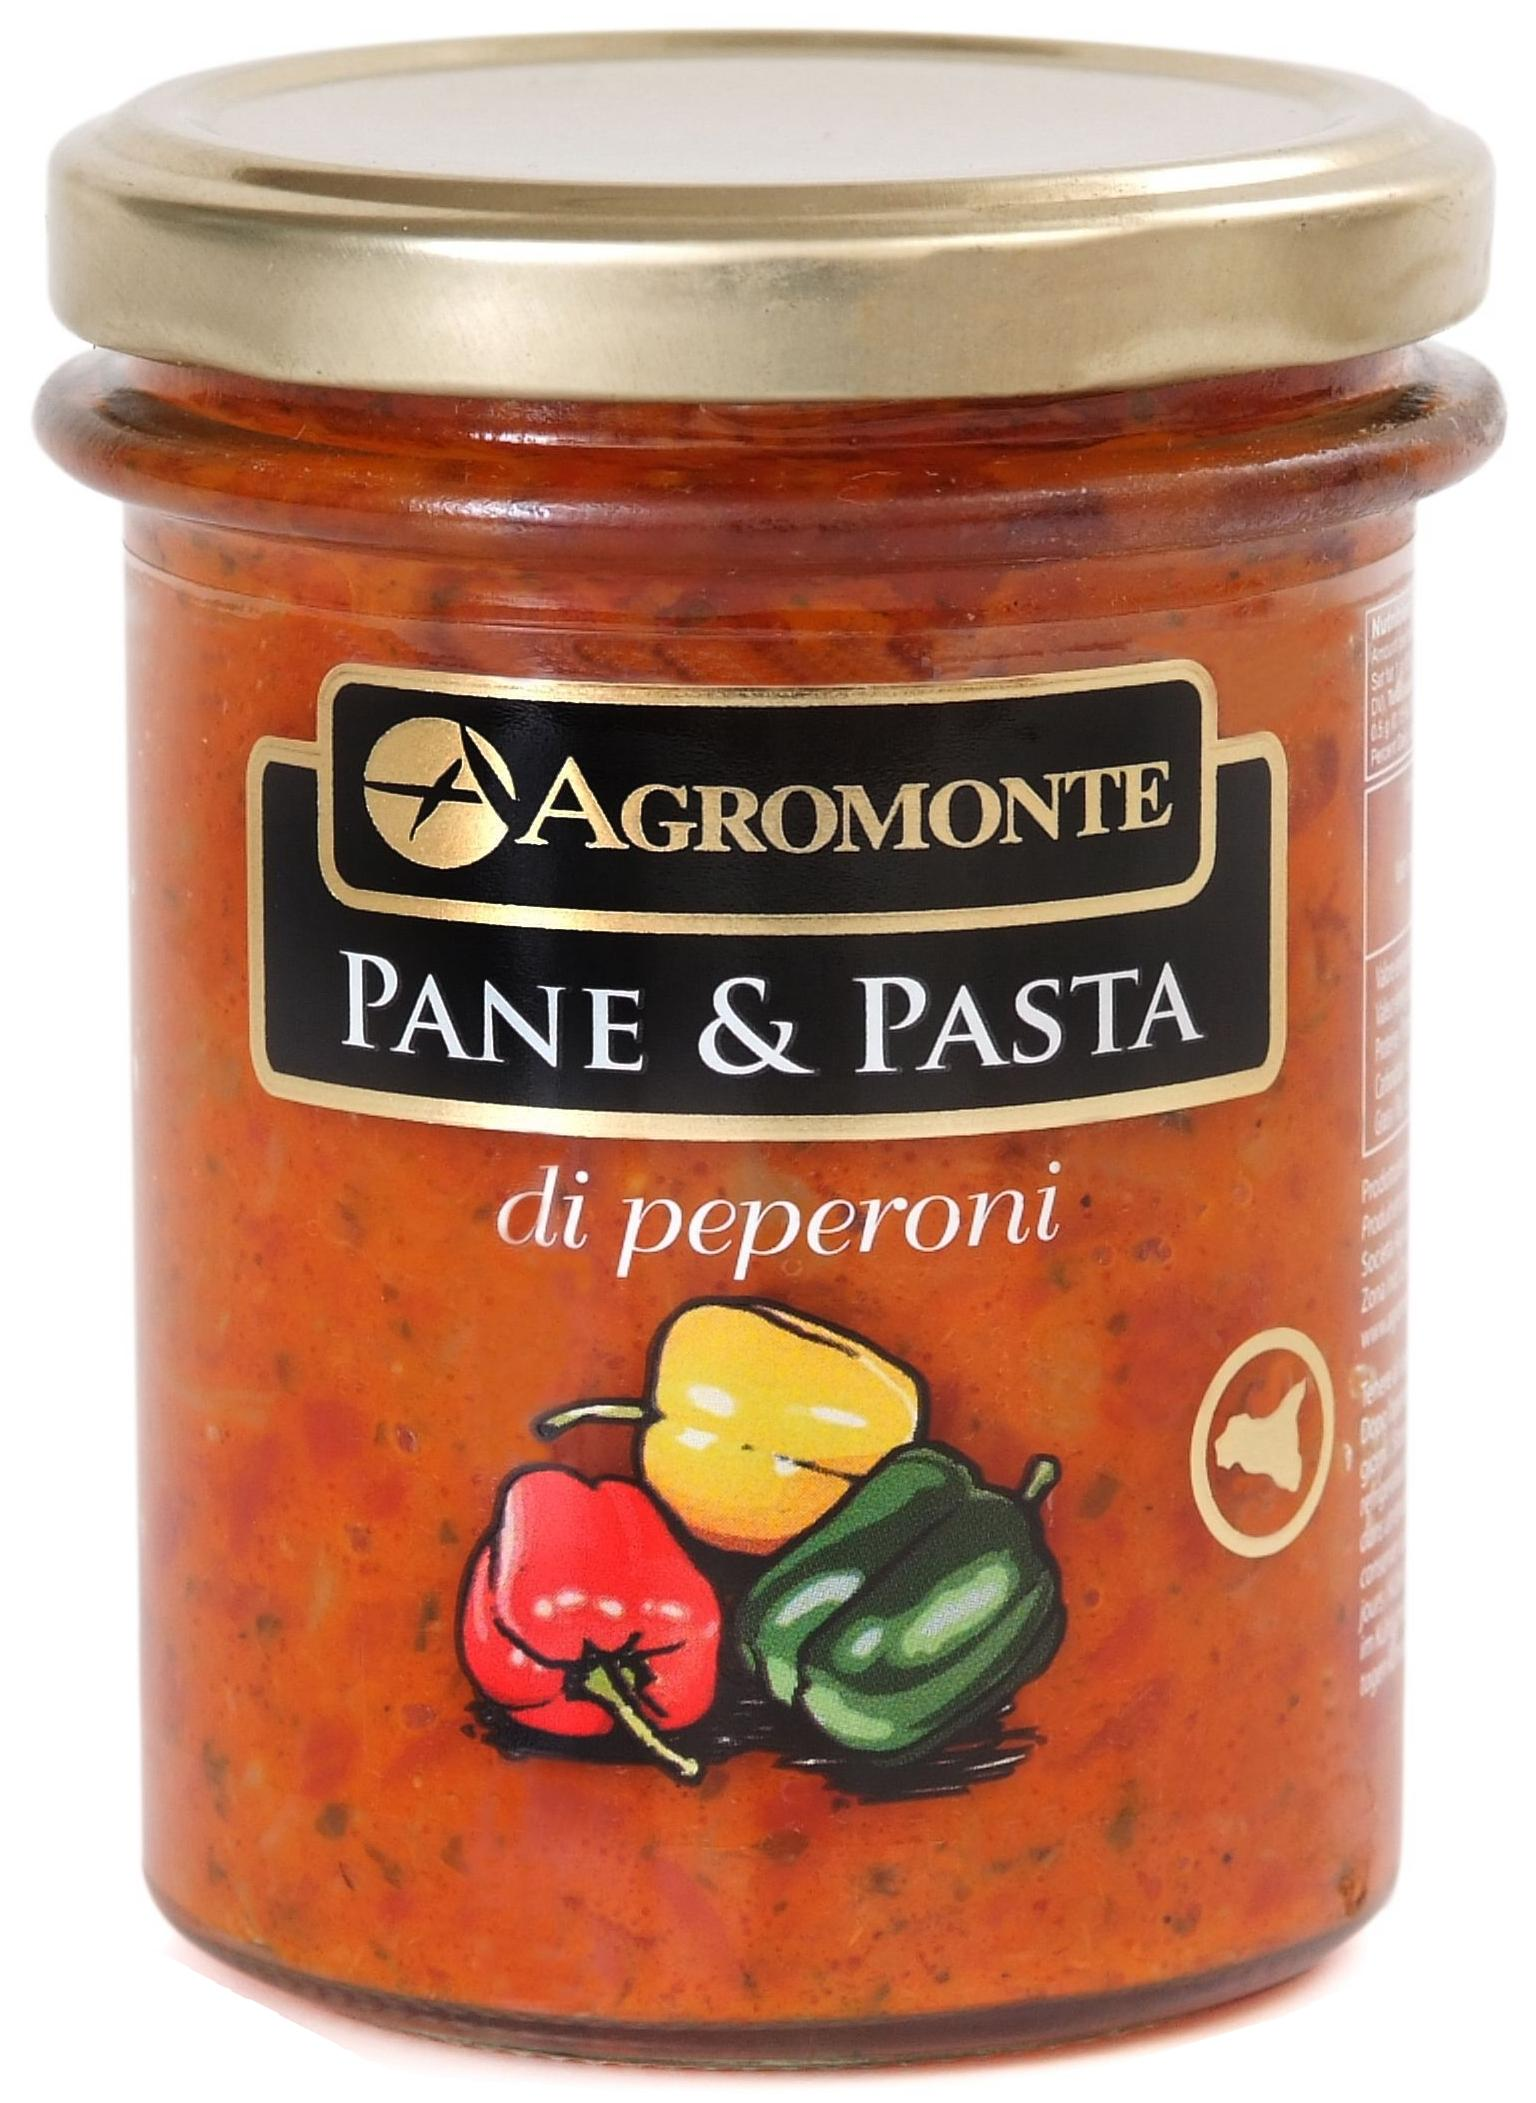 Agromonte Pane & Pasta di Peperoni